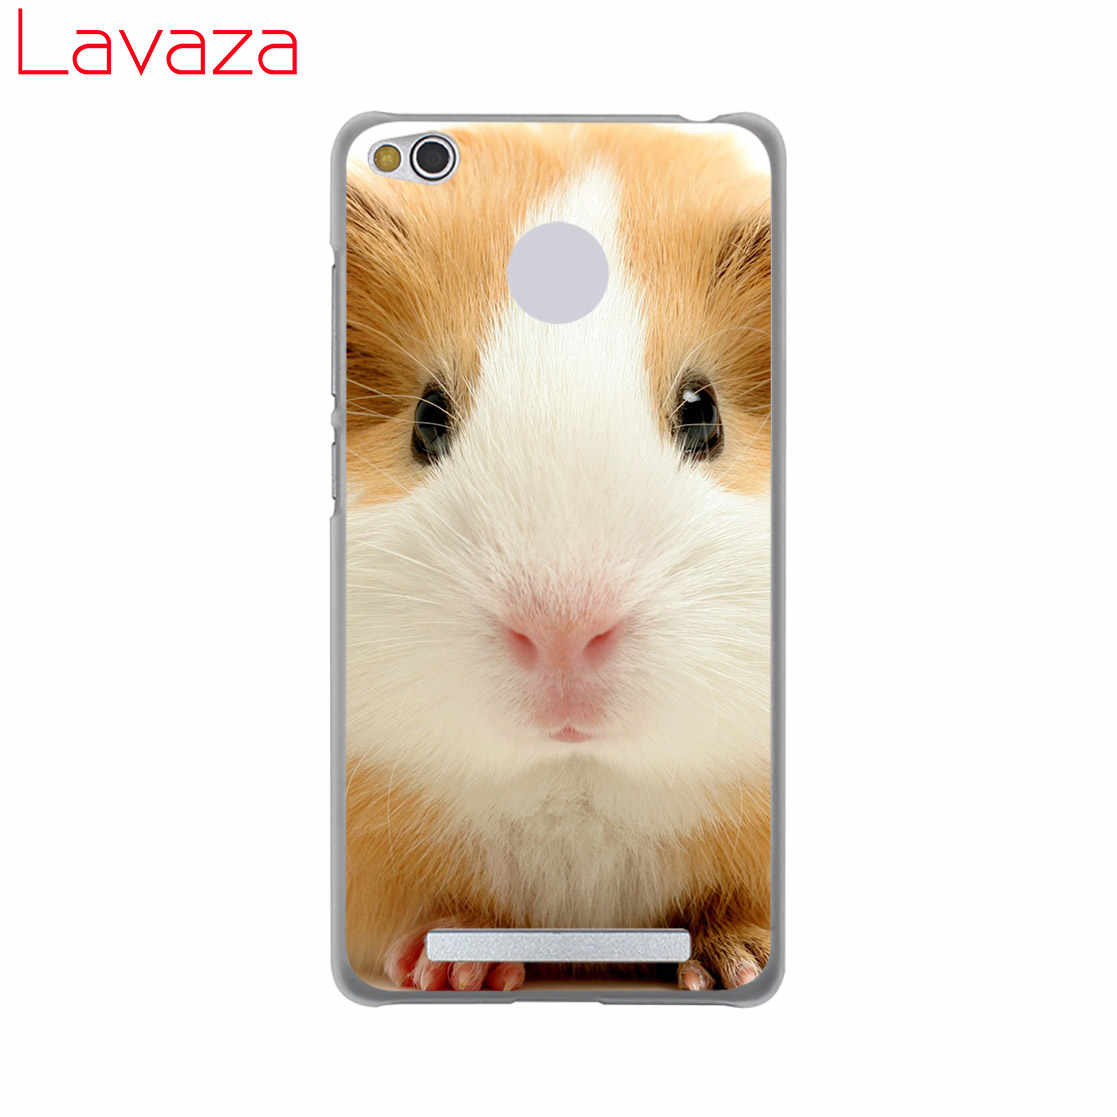 huge discount b02b3 012b5 Lavaza squirrel Guinea Pig Mouse peanut Hard Phone Cover Case for Xiaomi  Redmi 6A 4A S2 6 Note 5 Plus 4 6 Pro 4X 5A Prime Cases